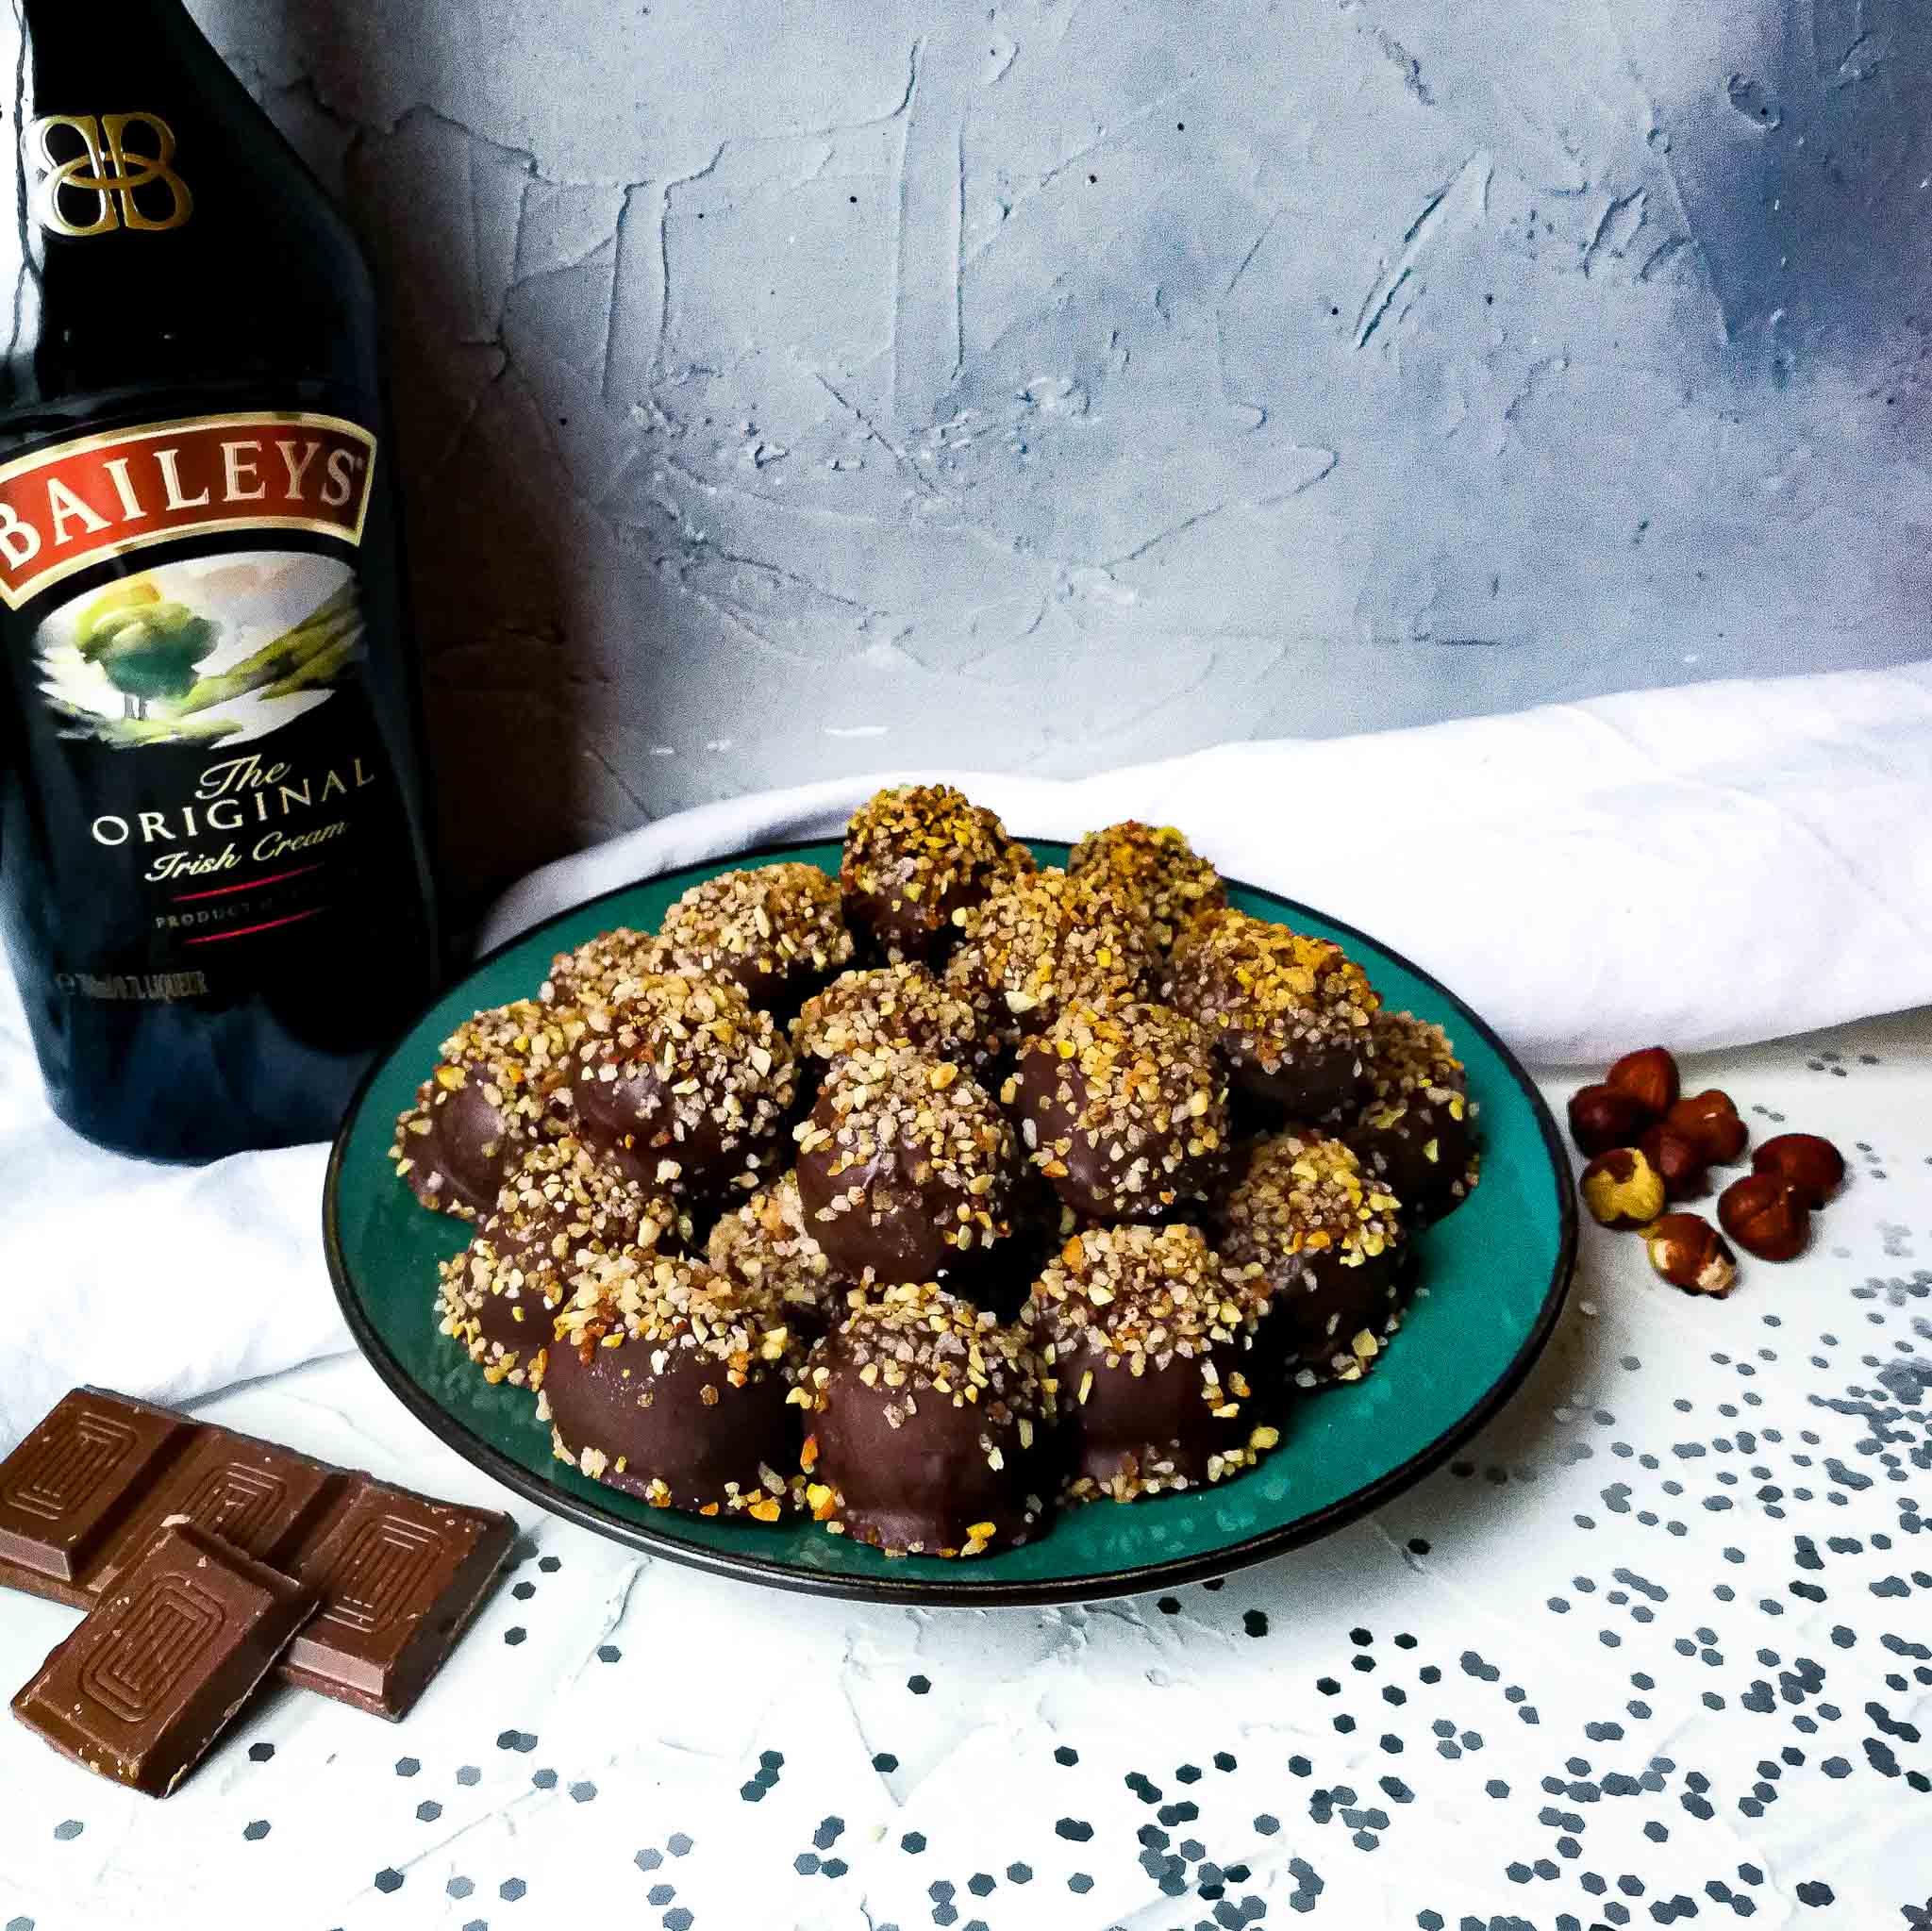 Bayleys-chocoladetruffels met nougatine